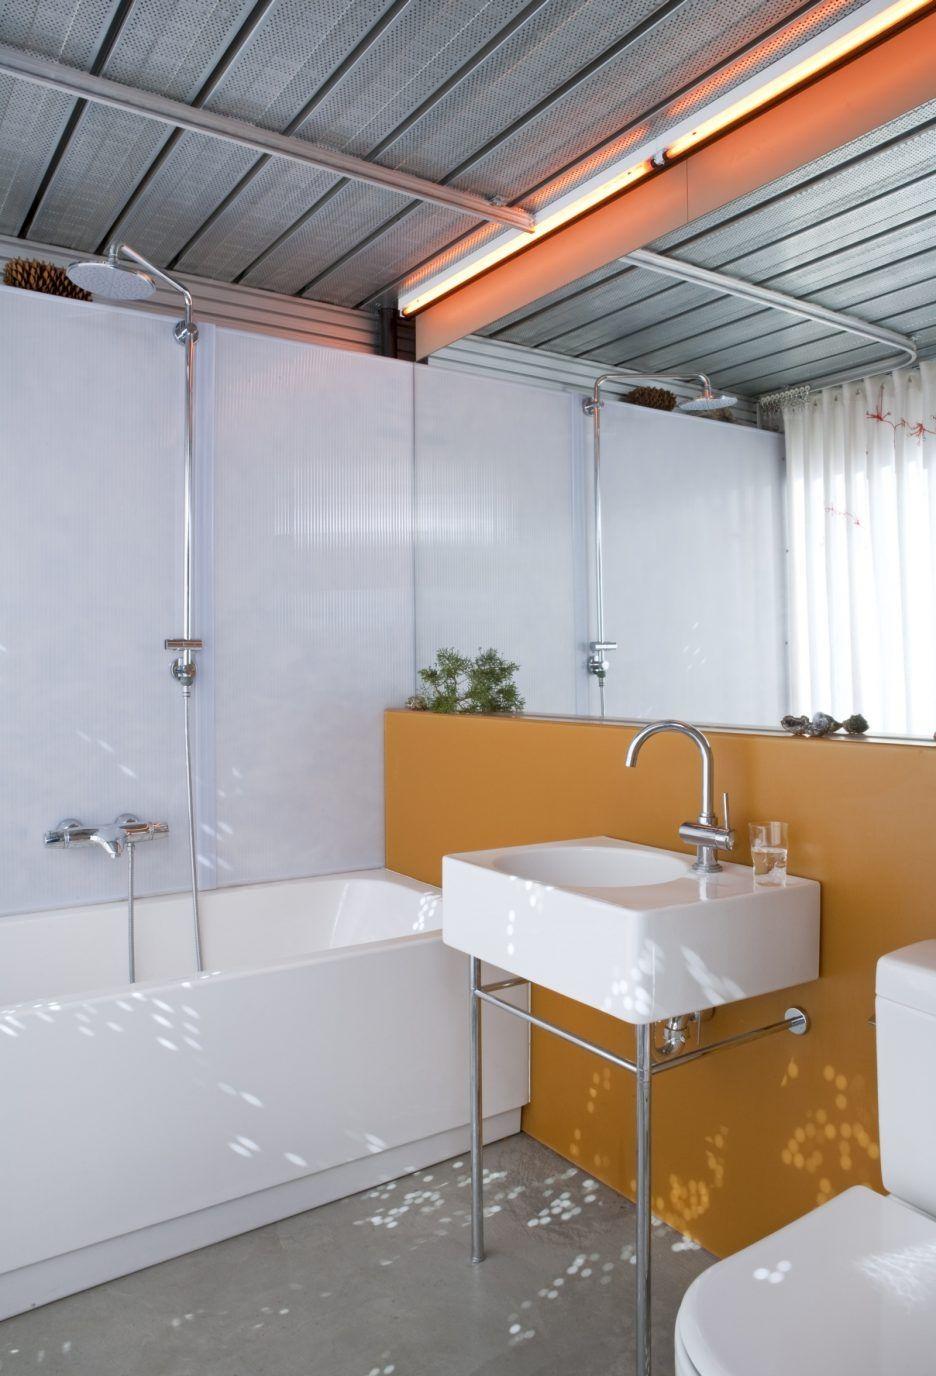 off grid bathroom solutions | bathroom ideas | pinterest